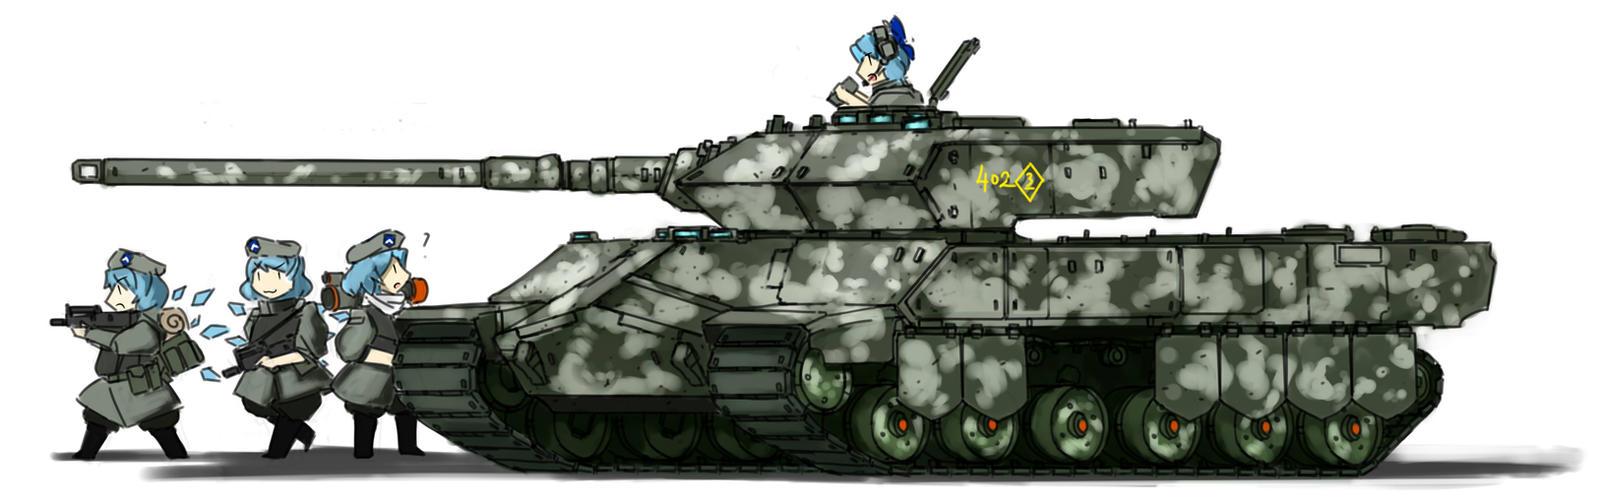 OBT-3 by Panzermeido